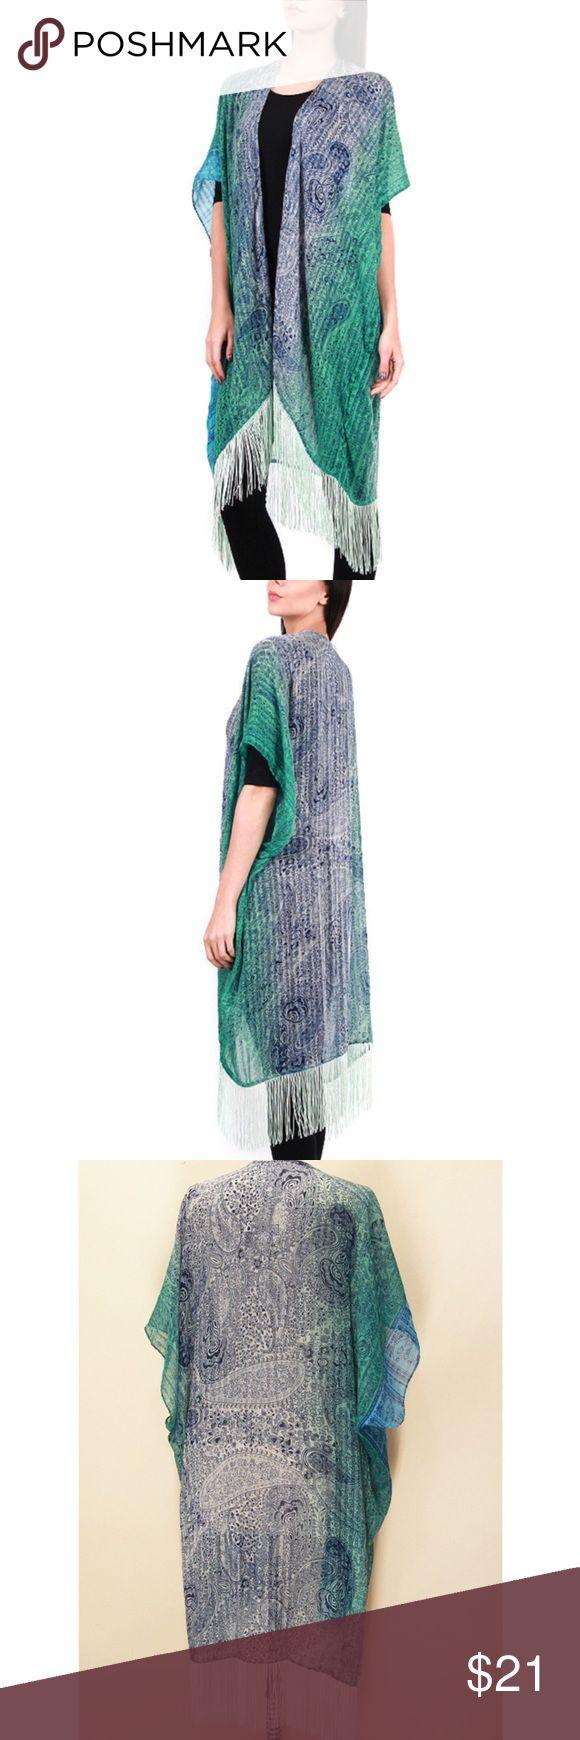 Teal Oversize Paisley Print Kimono Vest Material : 50% Cotton 50% Viscose Swim Coverups